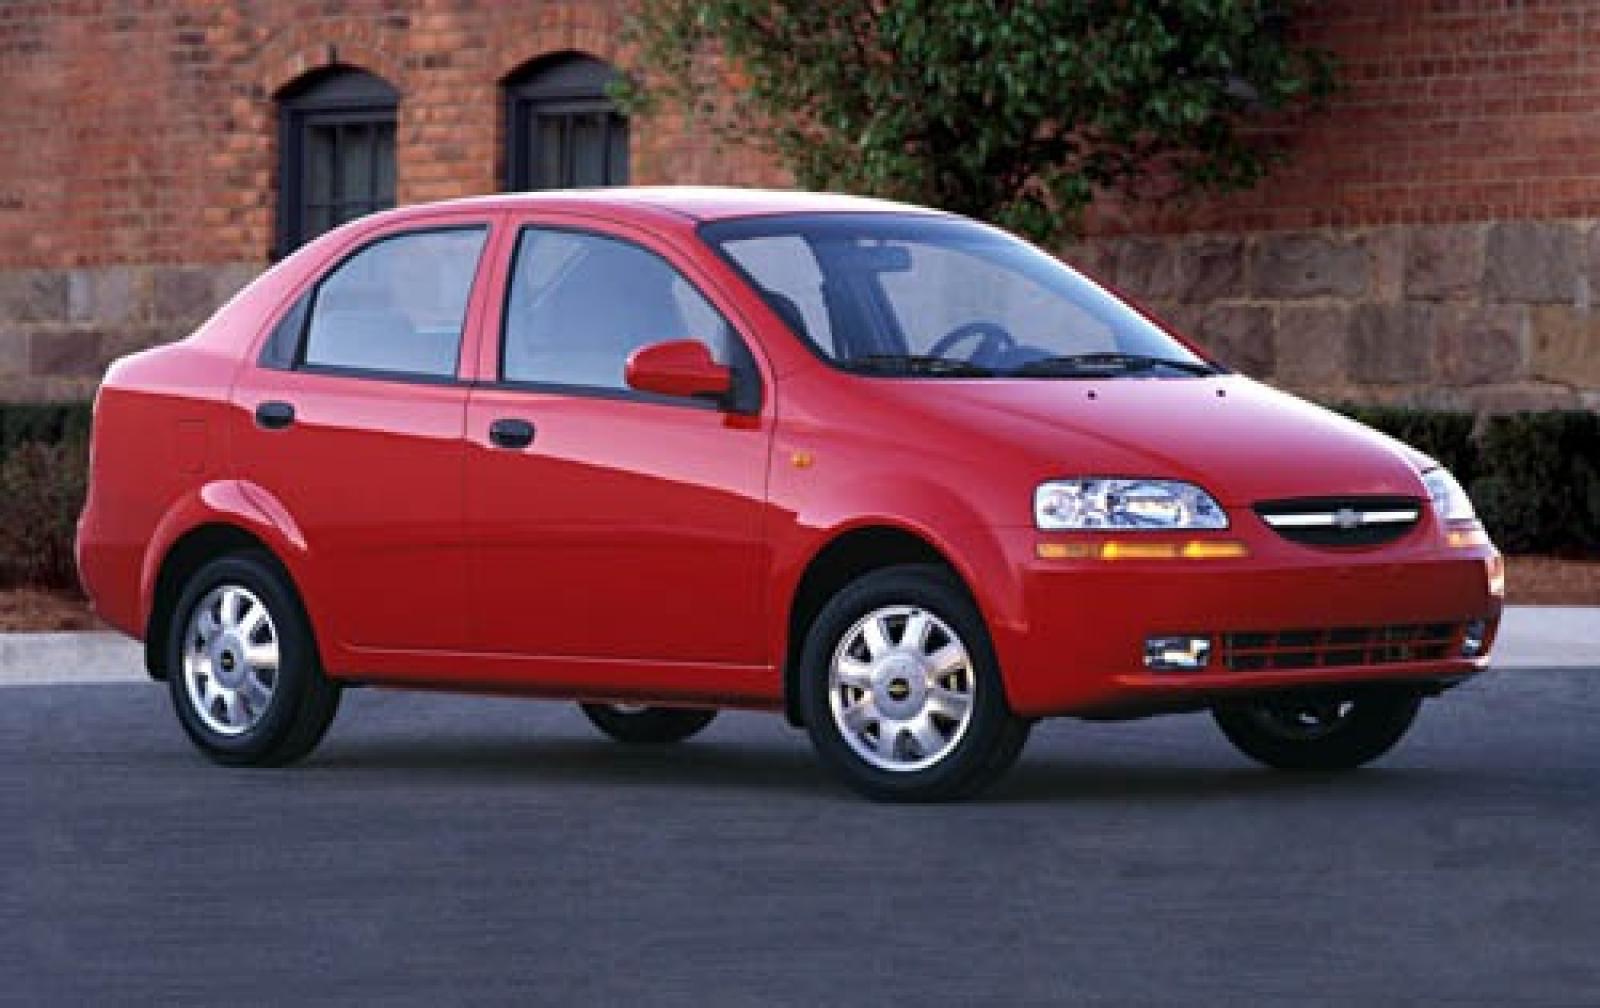 2005 Chevrolet Aveo #1 800 1024 1280 1600 origin